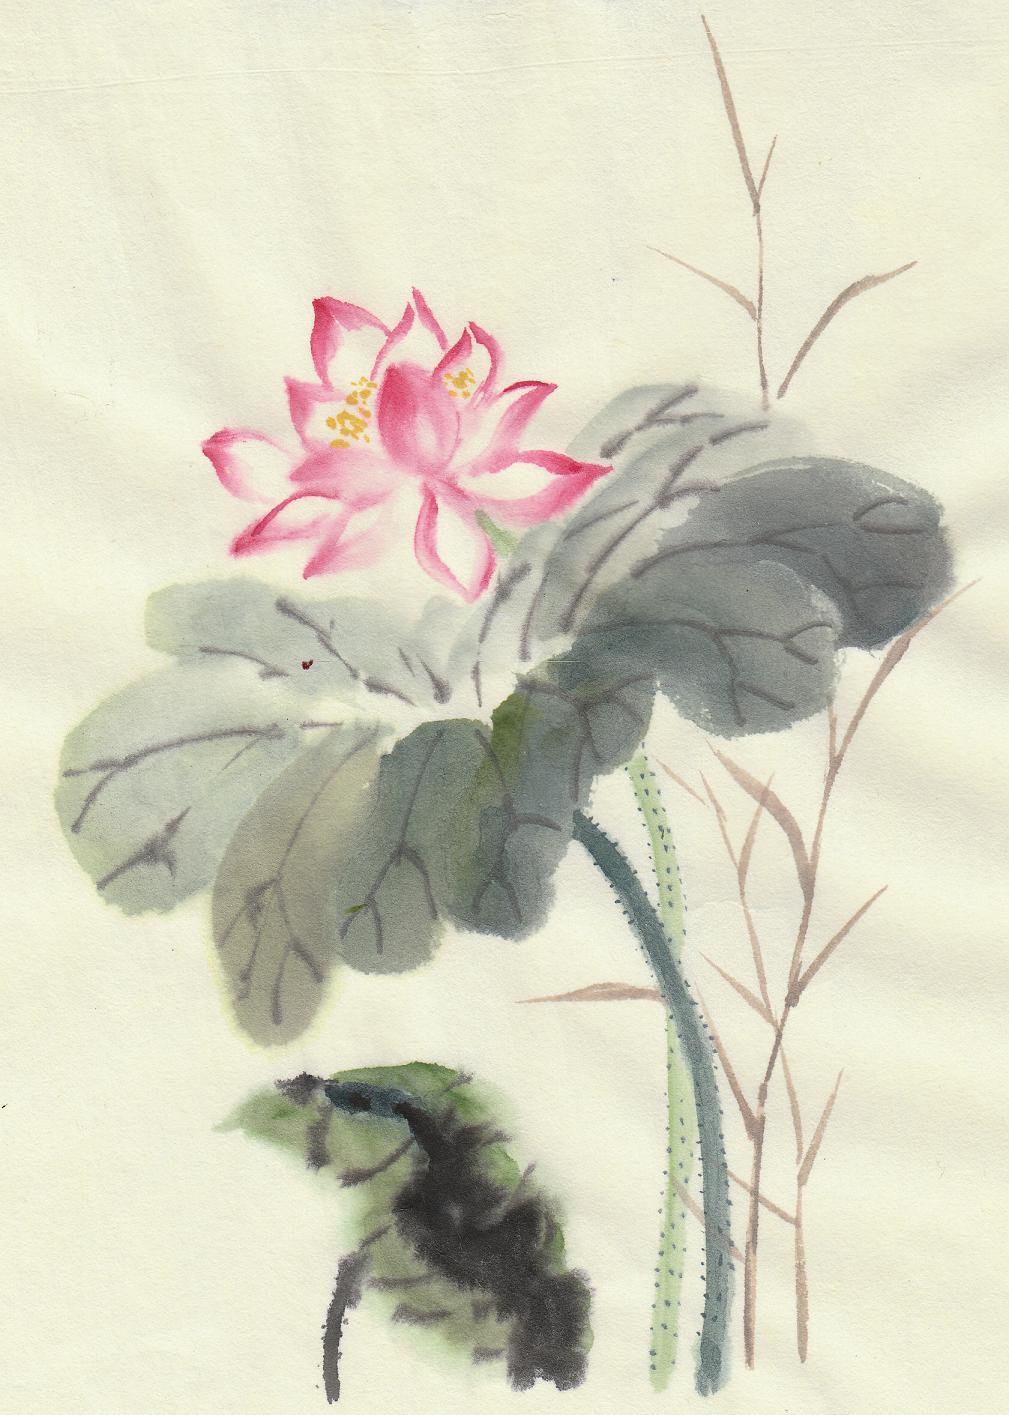 Simple Asian Paintings | www.imgkid.com - The Image Kid ...